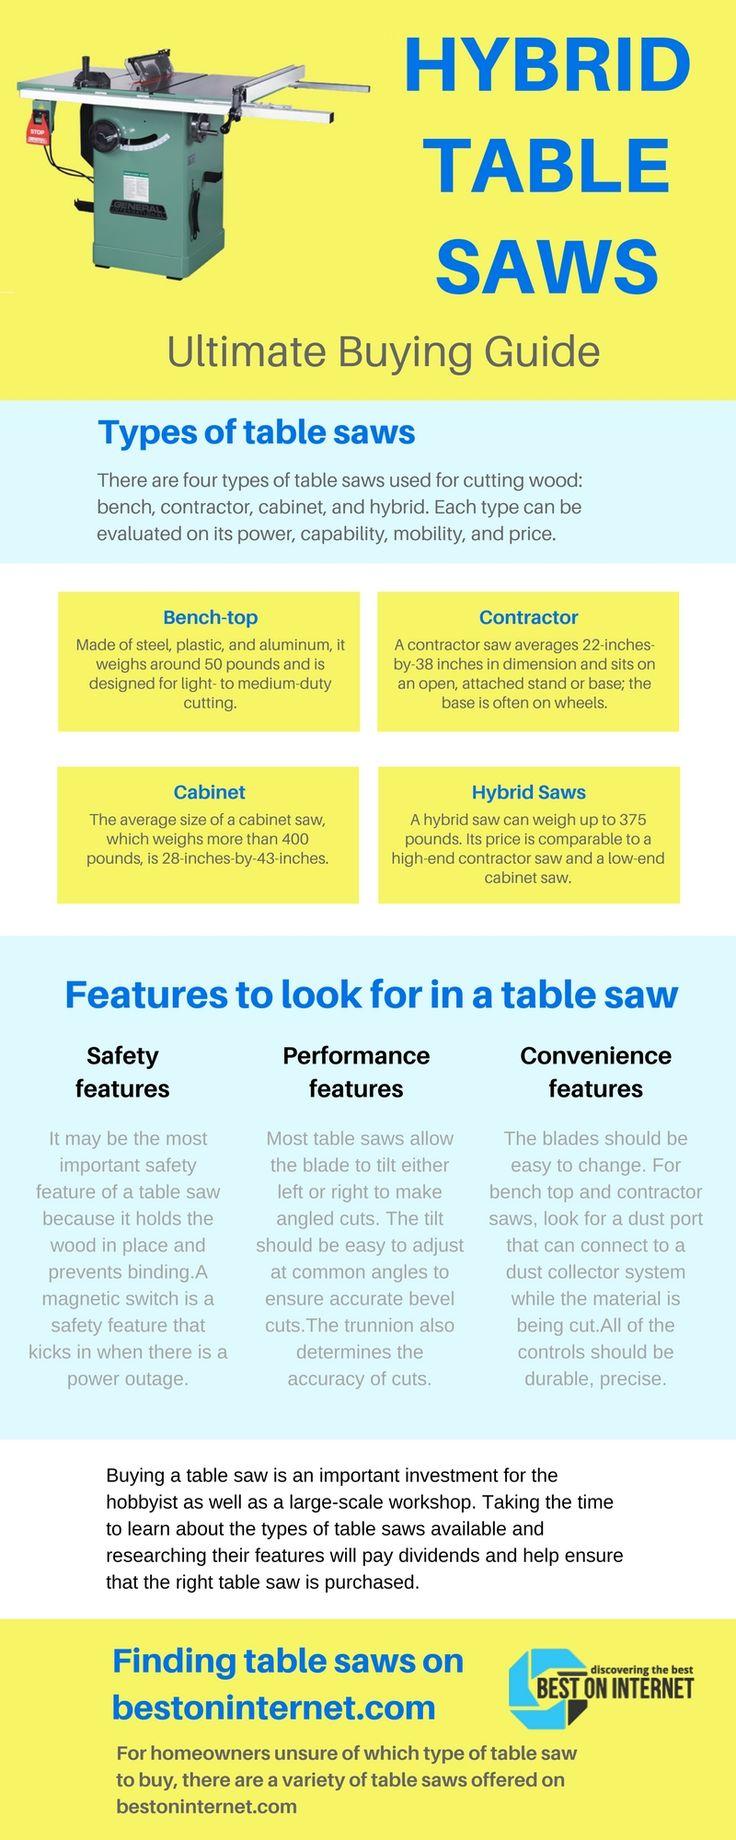 Tips for choosing best #HybridTableSaw http://www.bestoninternet.com/tools-home-improvement/power-tools/hybrid-table-saw-money/